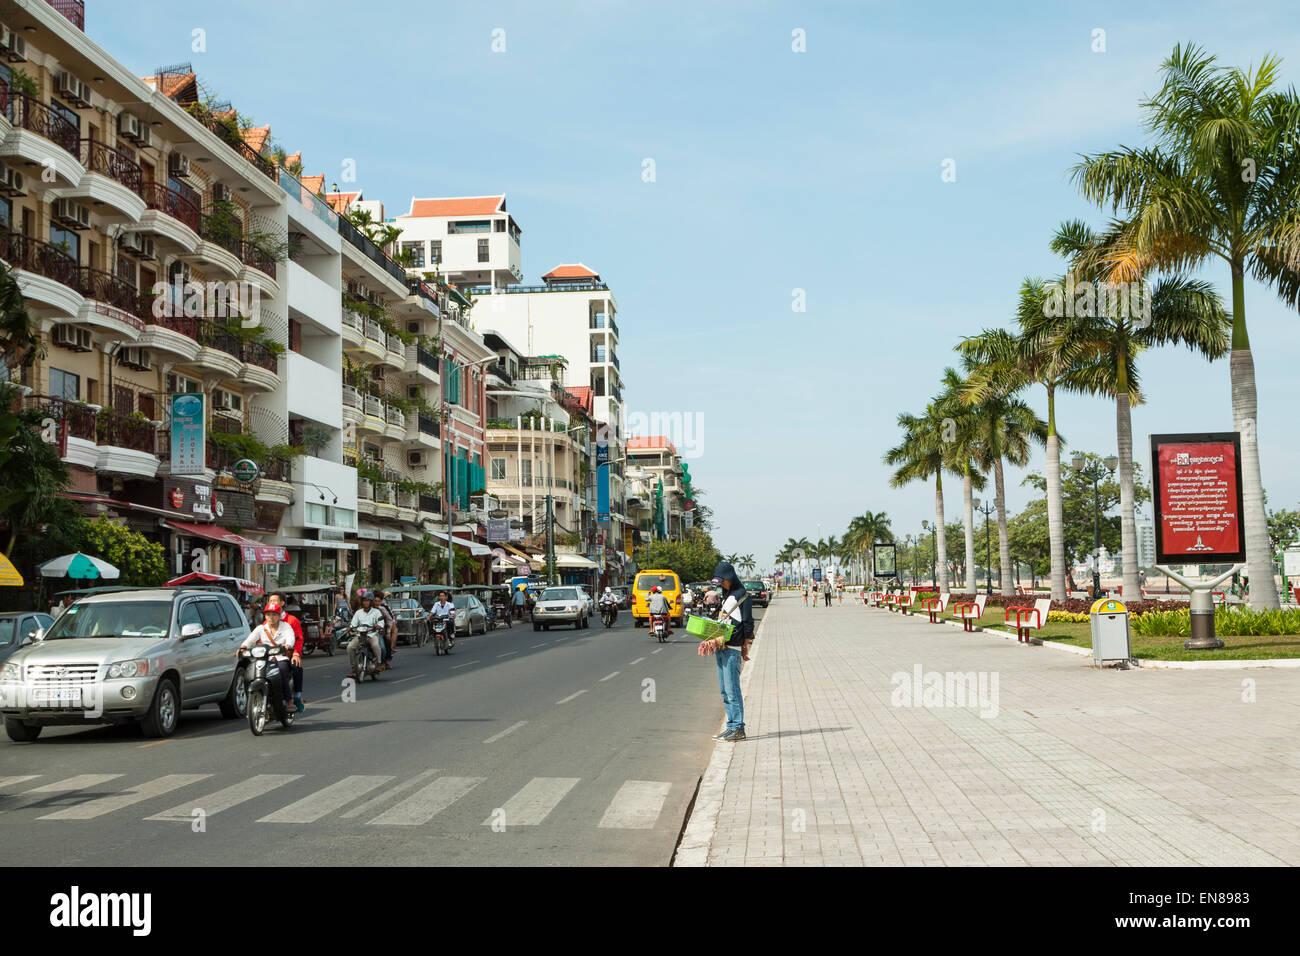 Preah Sisowath Quay - The beautiful riverside street in Phnom Penh, Cambodia, Asia. Stock Photo